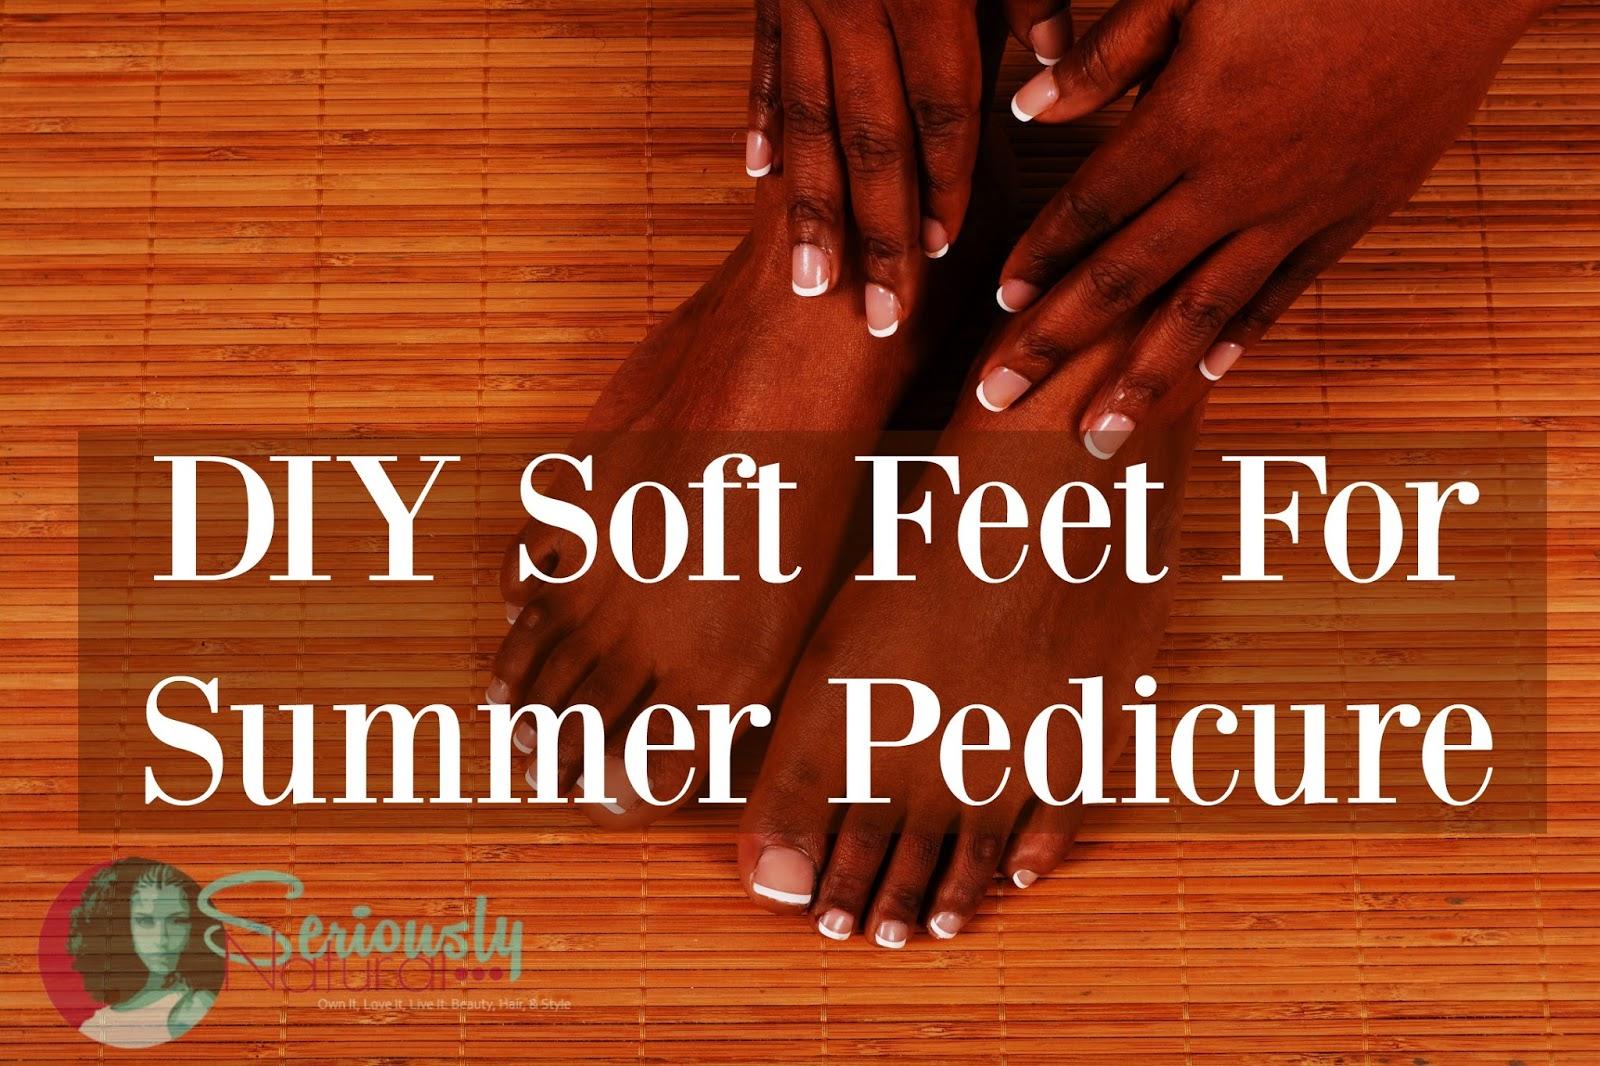 Quick DIY Soft Feet For Summer Pedicure